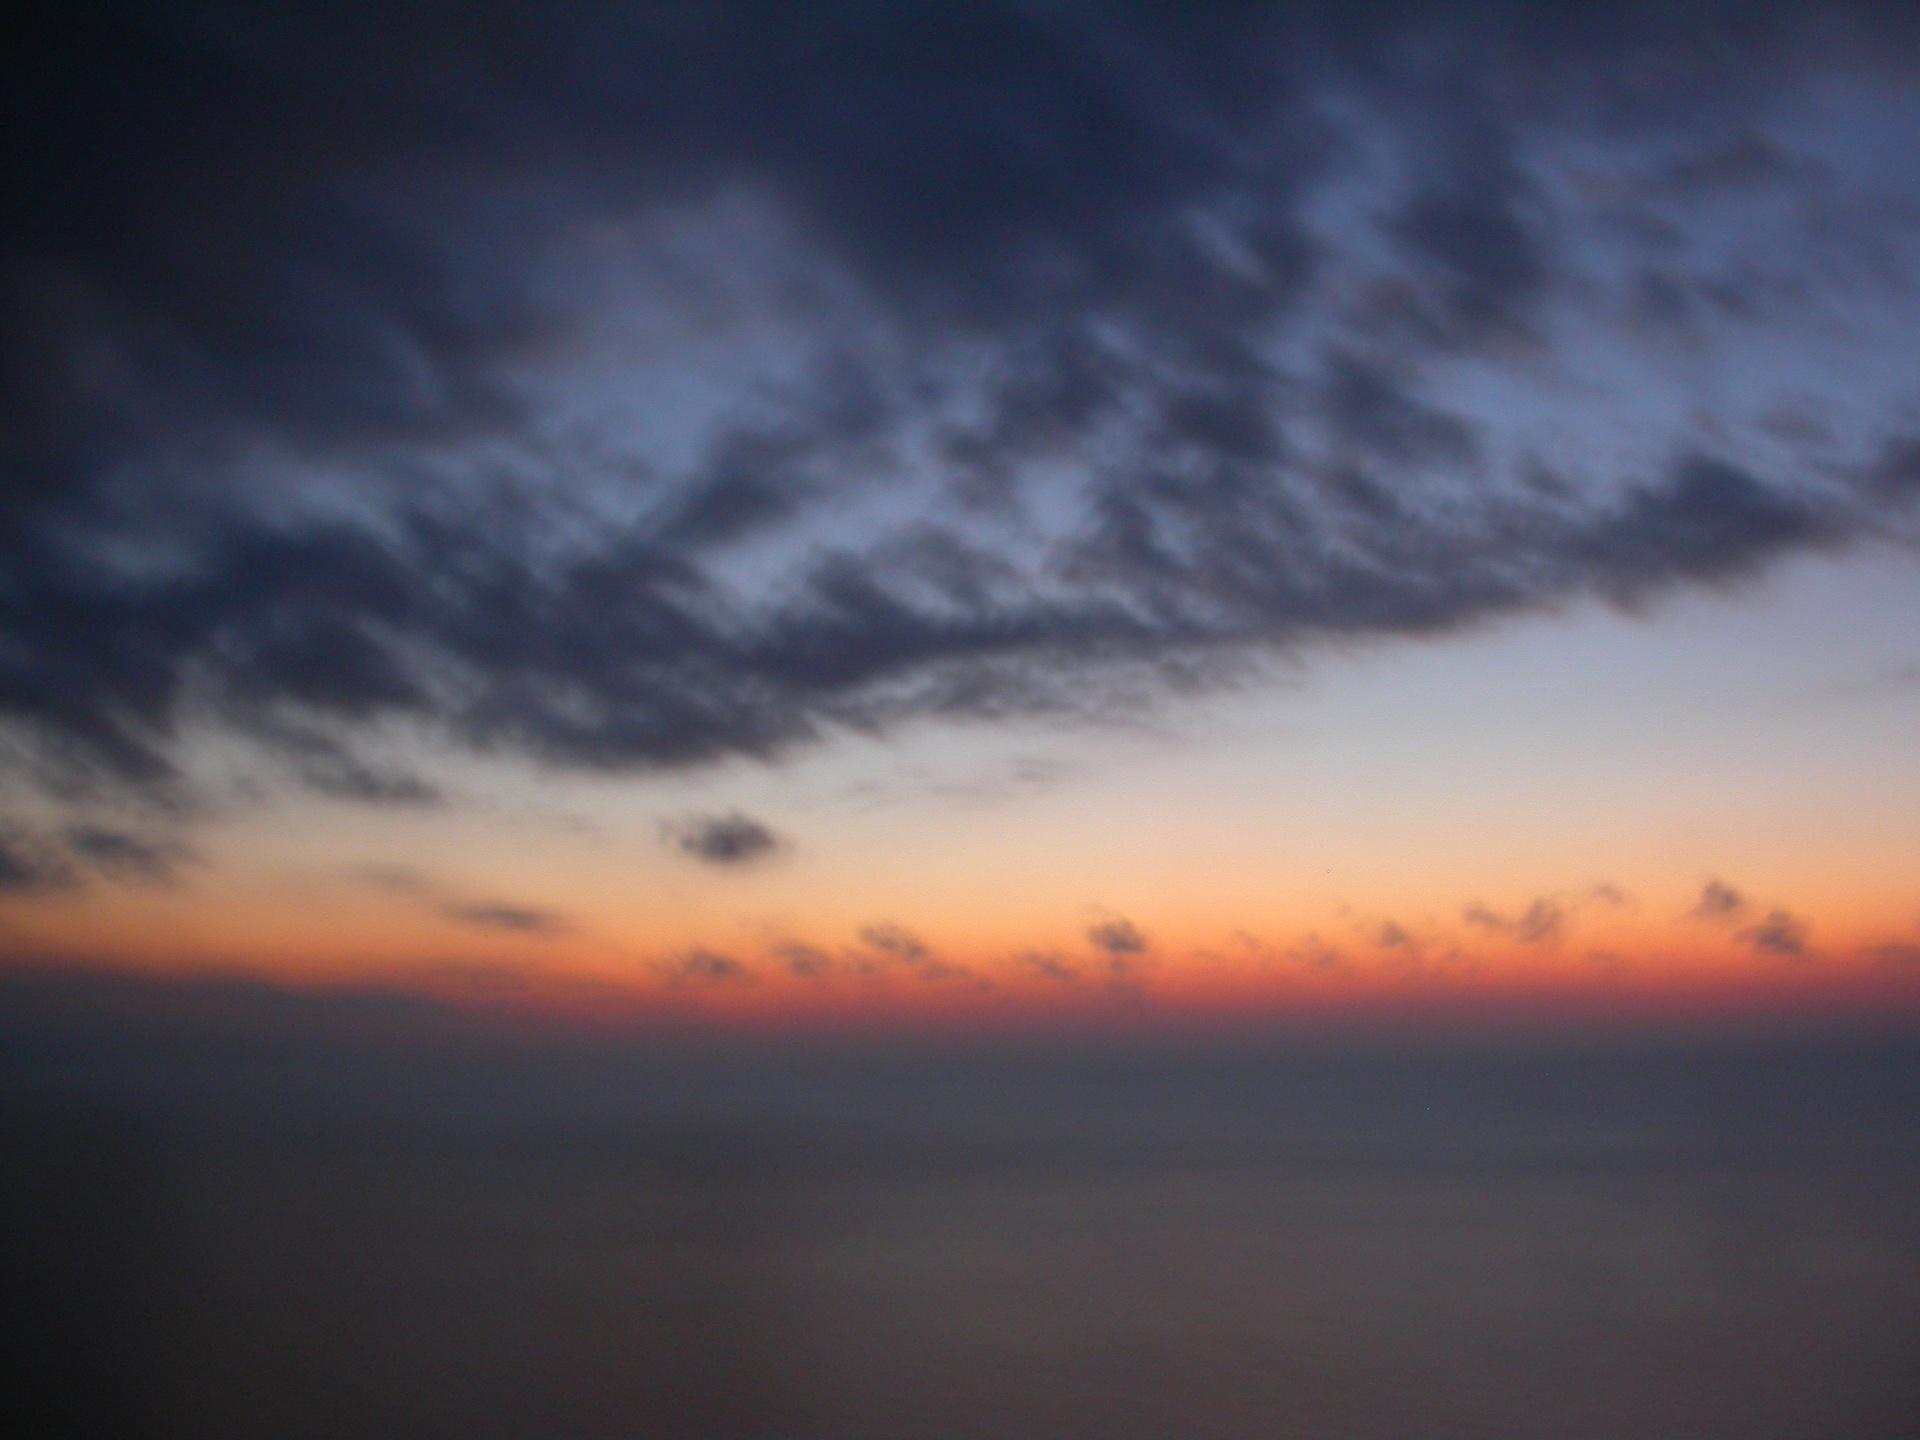 BLEU 3 (Horizon) - Blandine Armand - série photos